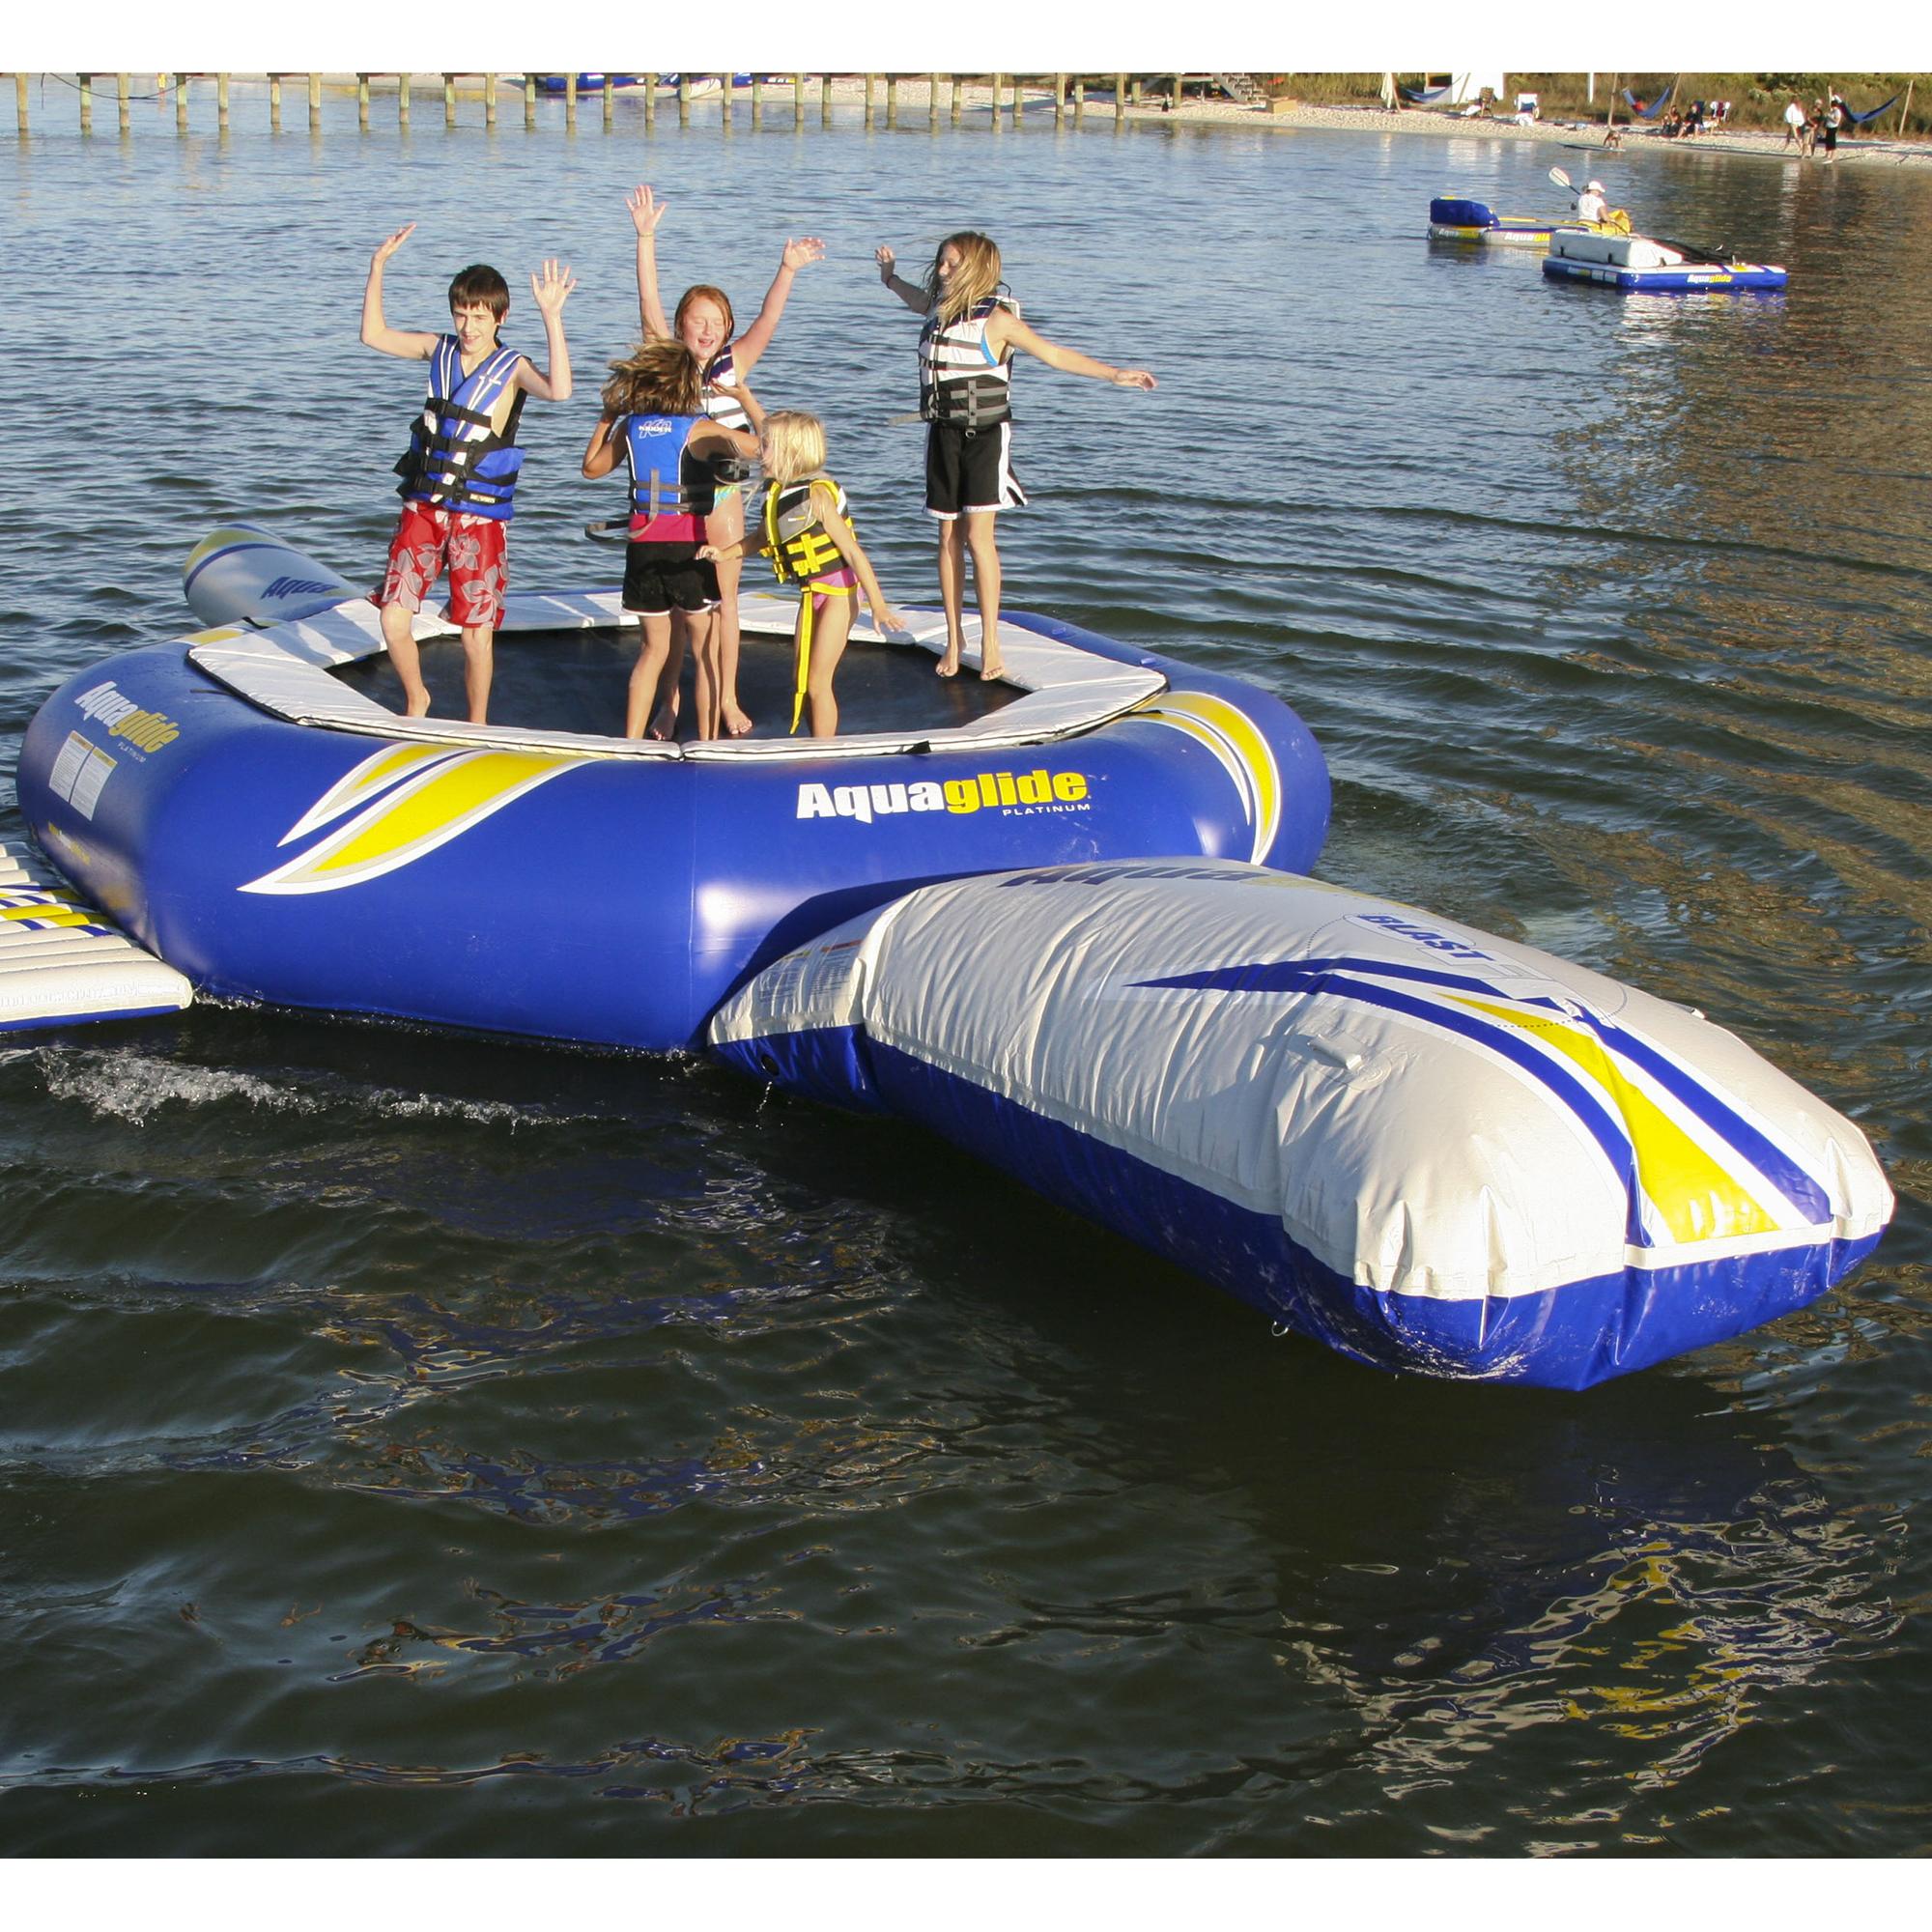 Aquaglide Supertramp Trampoline With Blast And I-Log